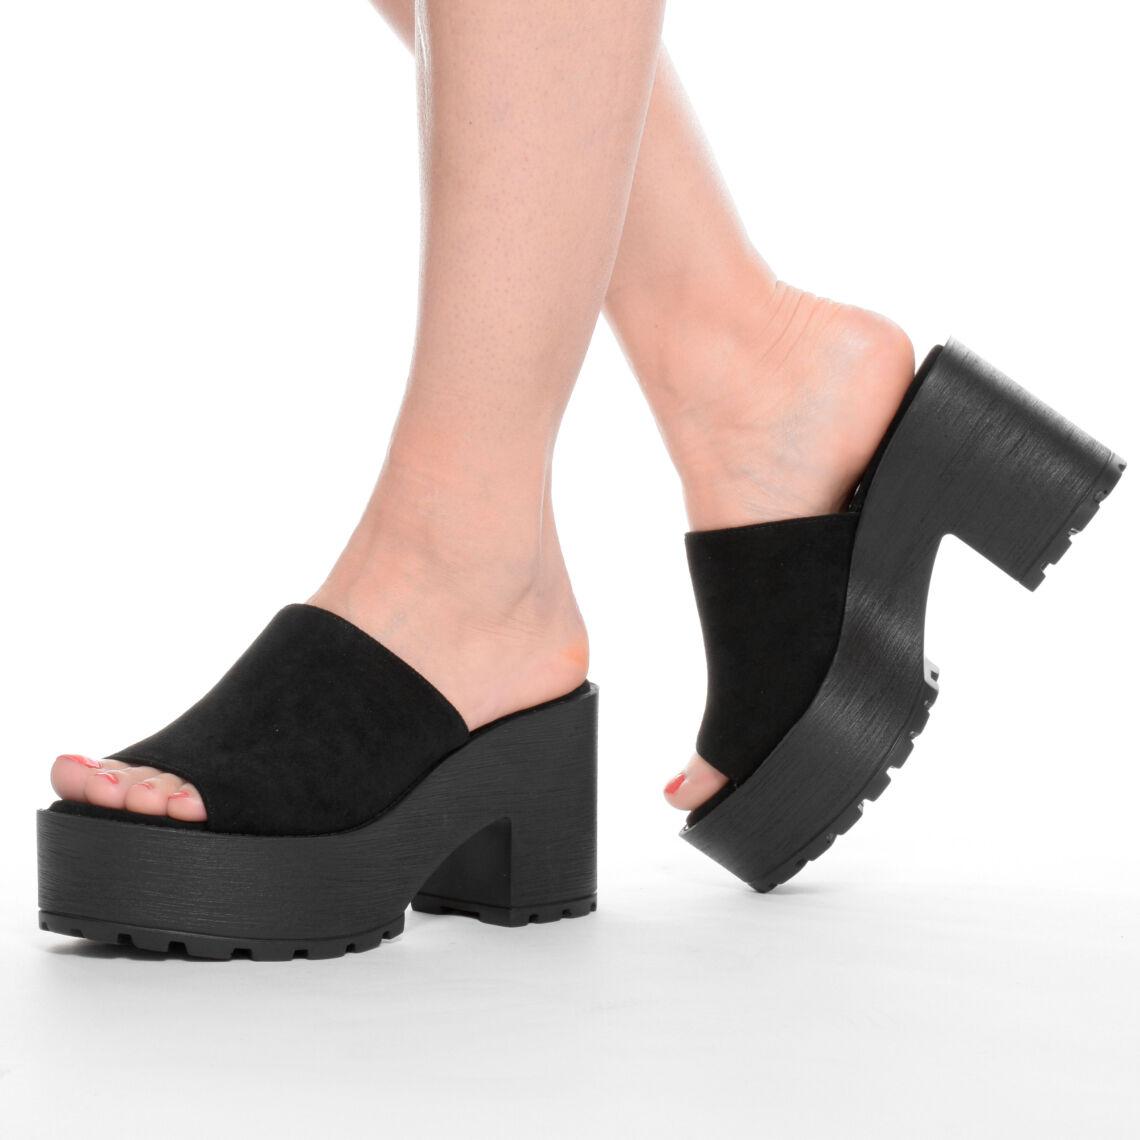 99e388ef44 Női fekete magas talpú művelúr papucs - NŐI PAPUCS - Női cipő ...